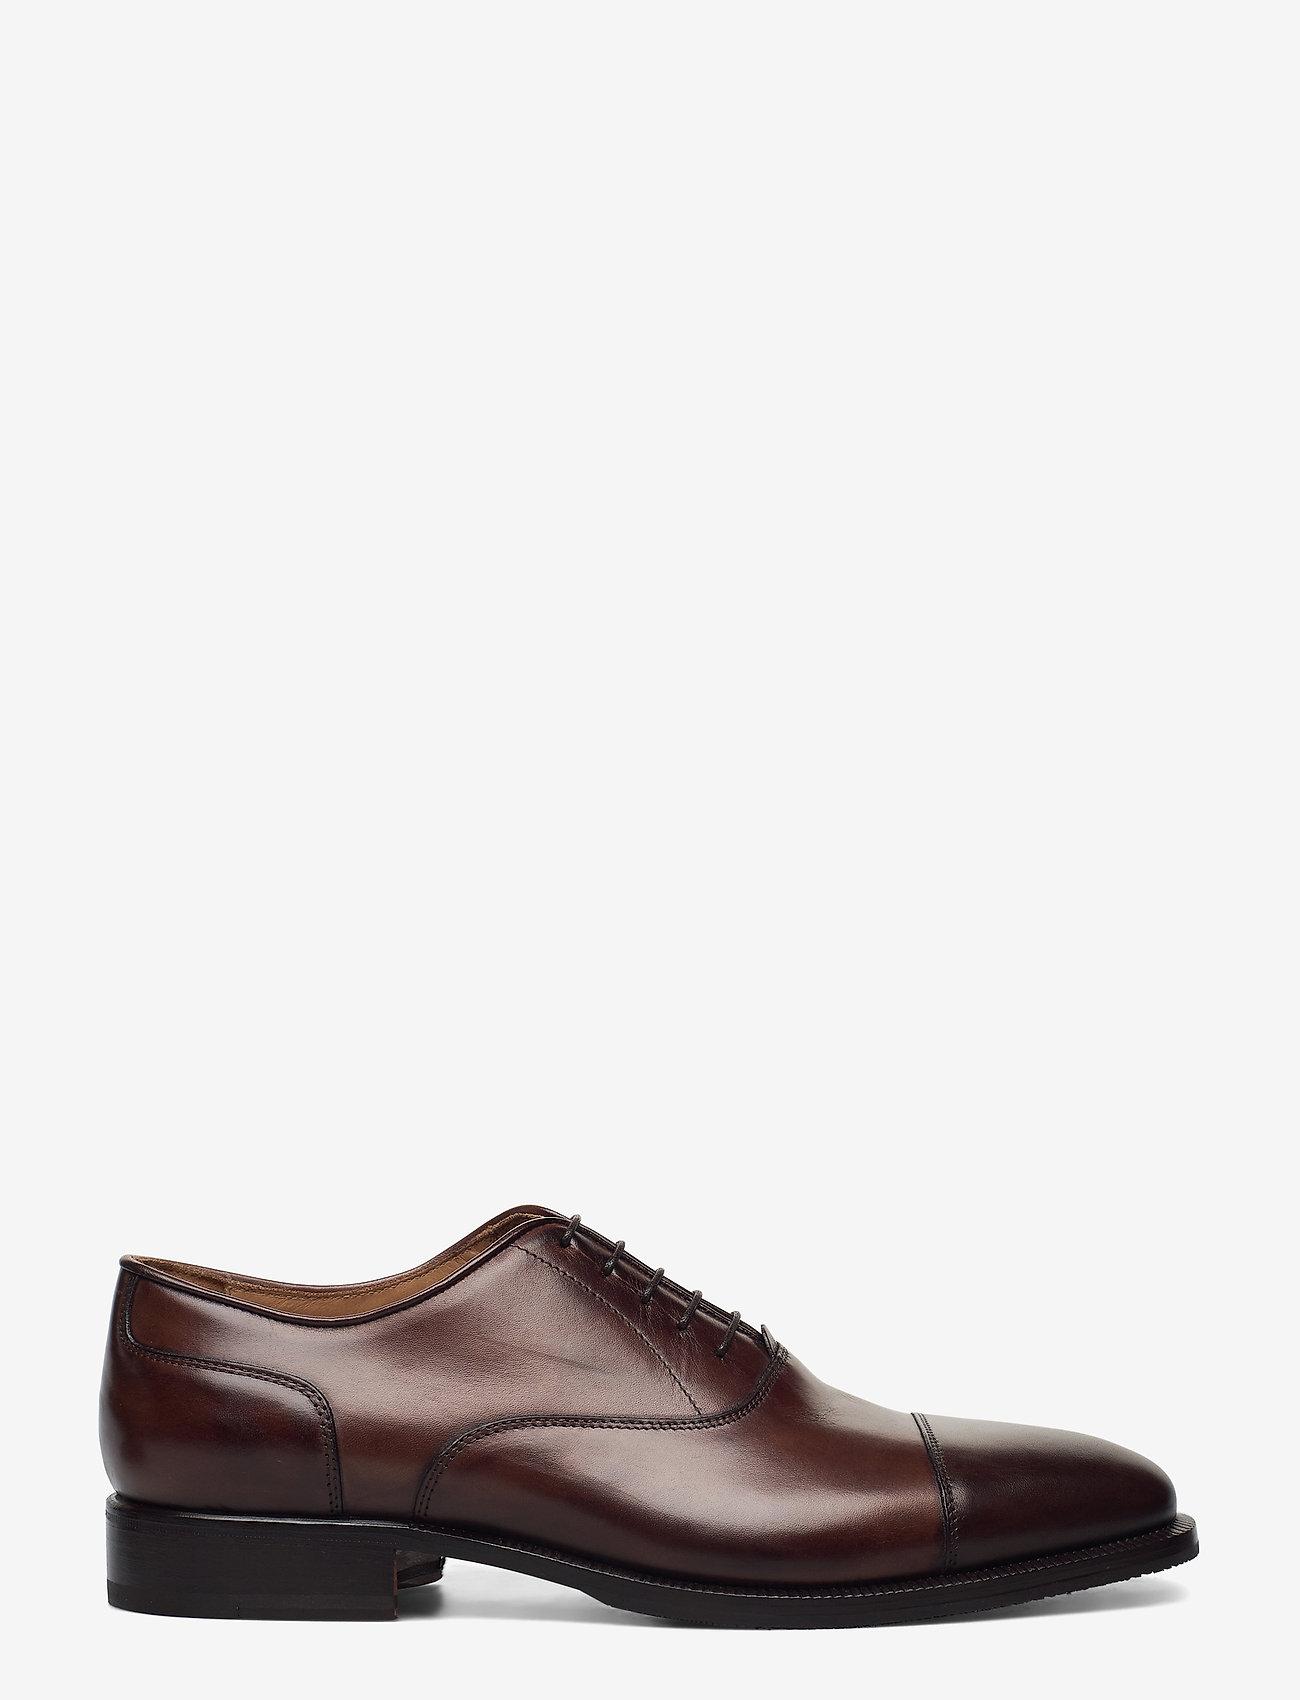 SAND - Footwear MW - F726 - nauhakengät - dark brown - 1